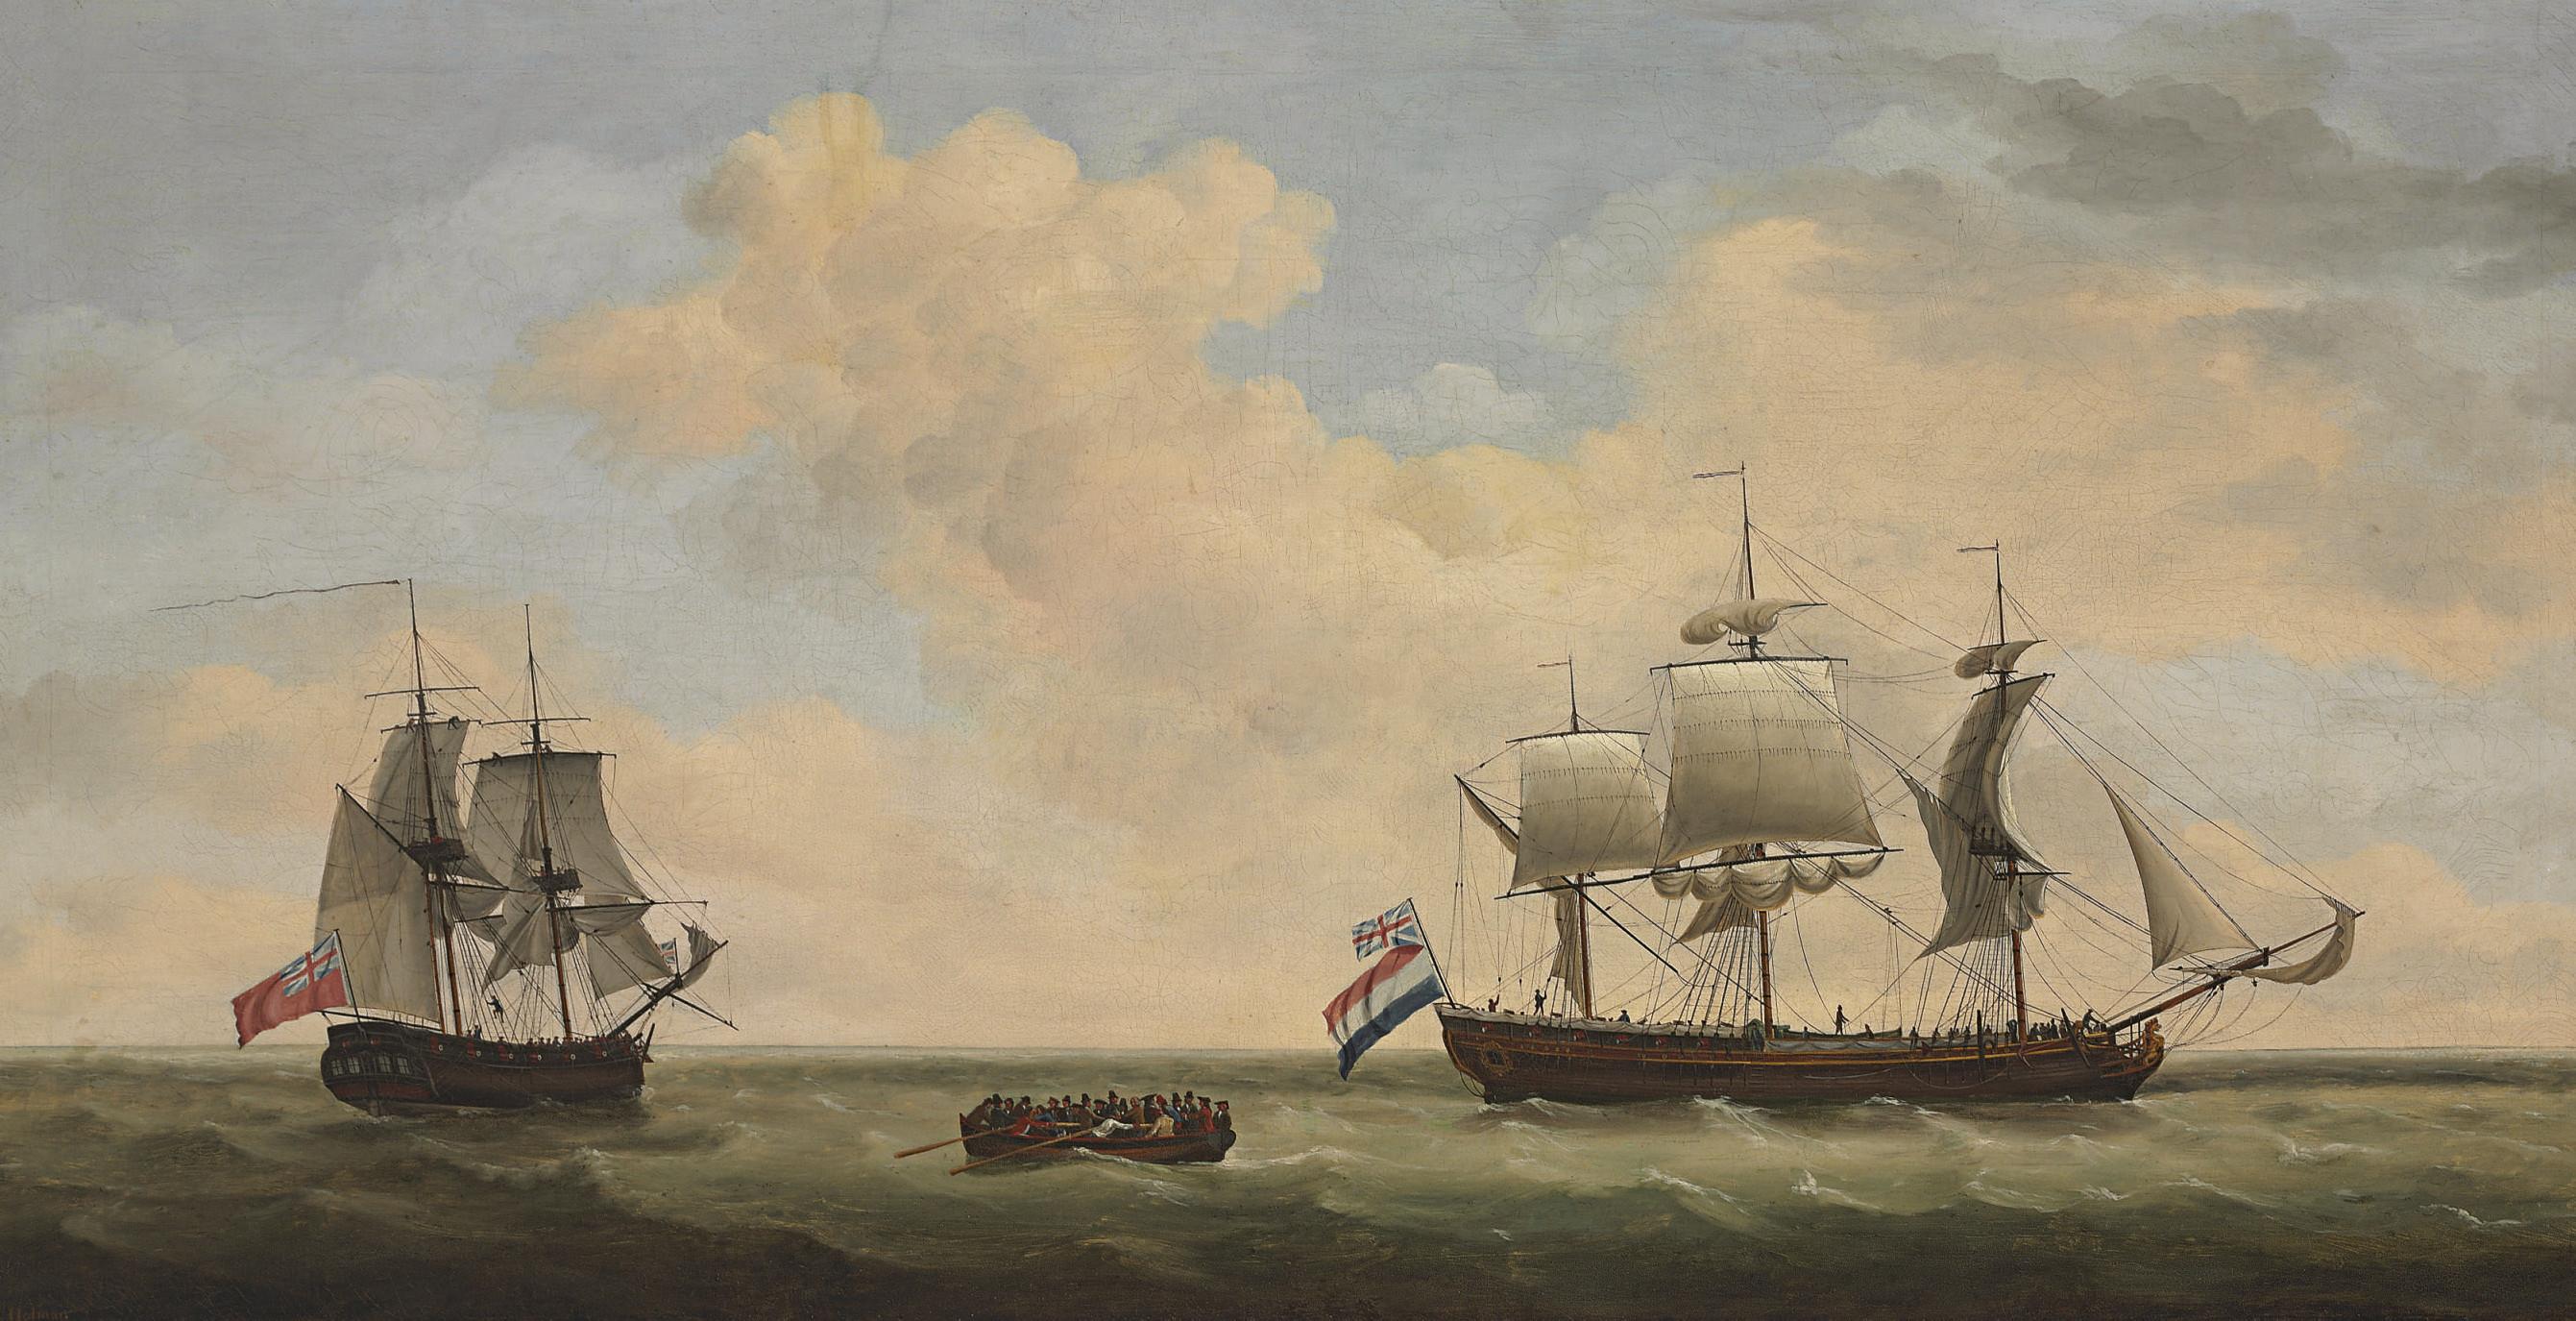 A Royal Navy 14-gun brig accepting the surrender of a Dutch East Indiaman